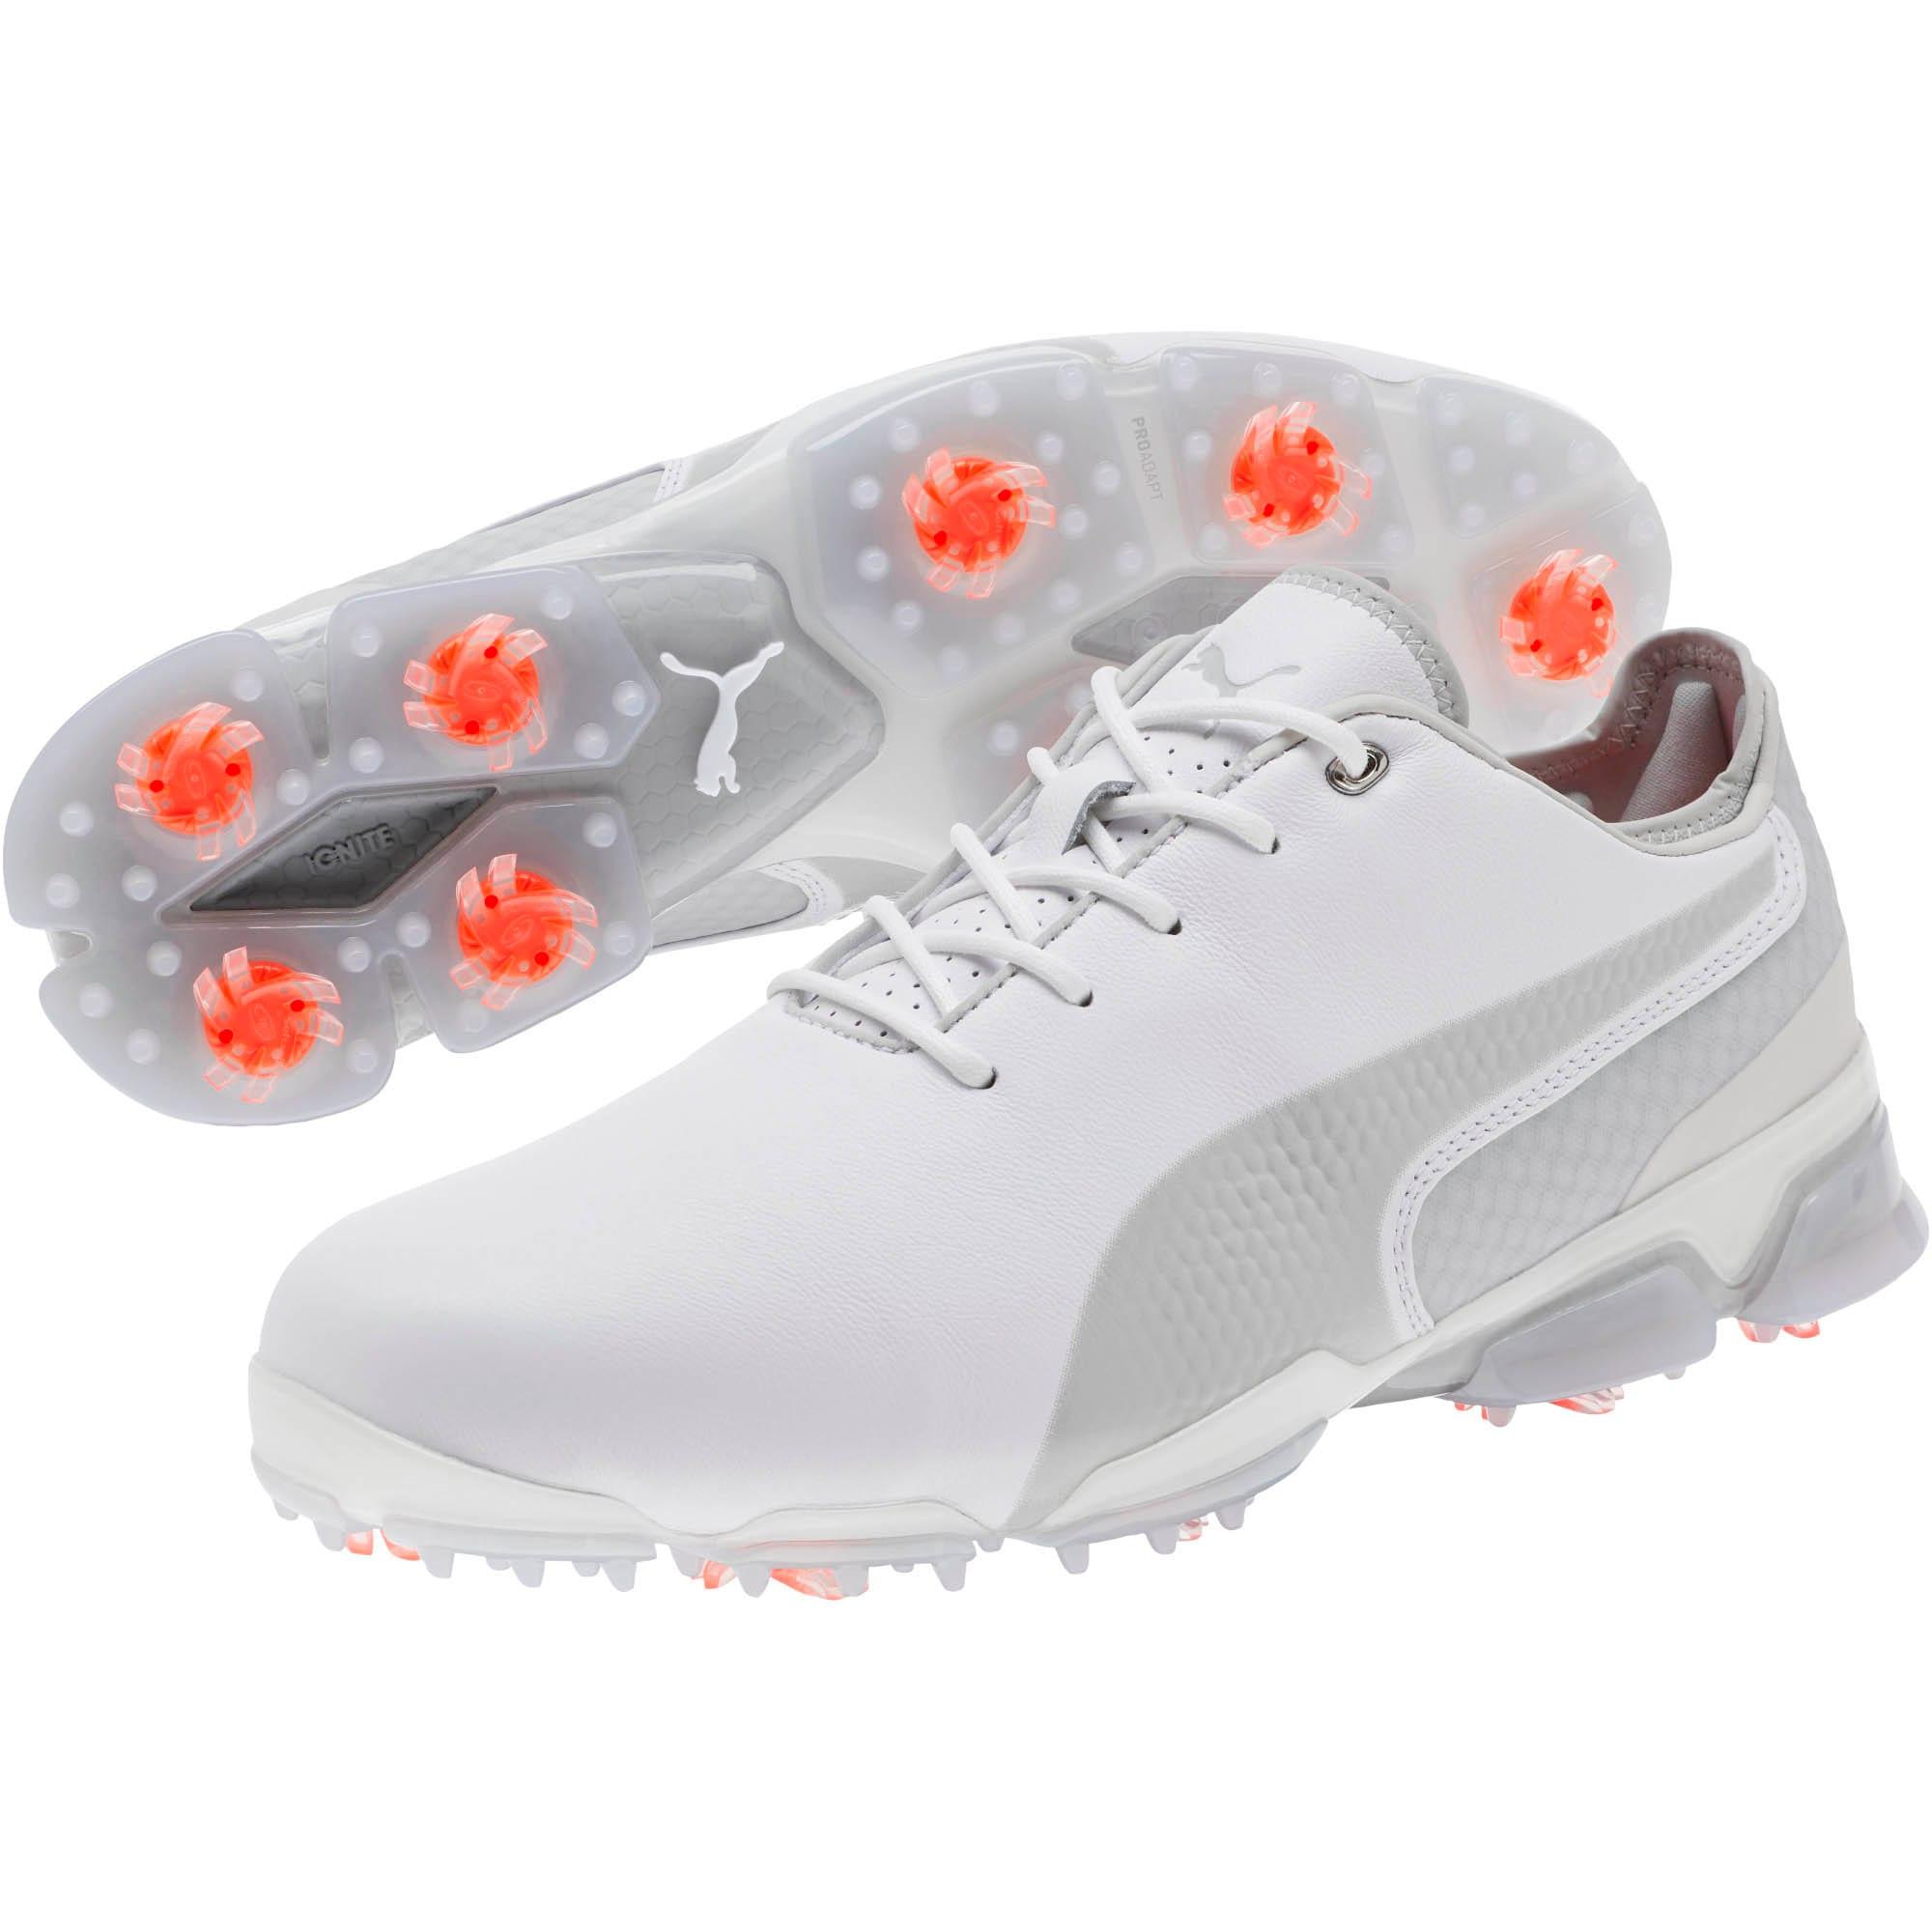 Thumbnail 2 of IGNITE PROADAPT Men's Golf Shoes, White-Gray Violet, medium